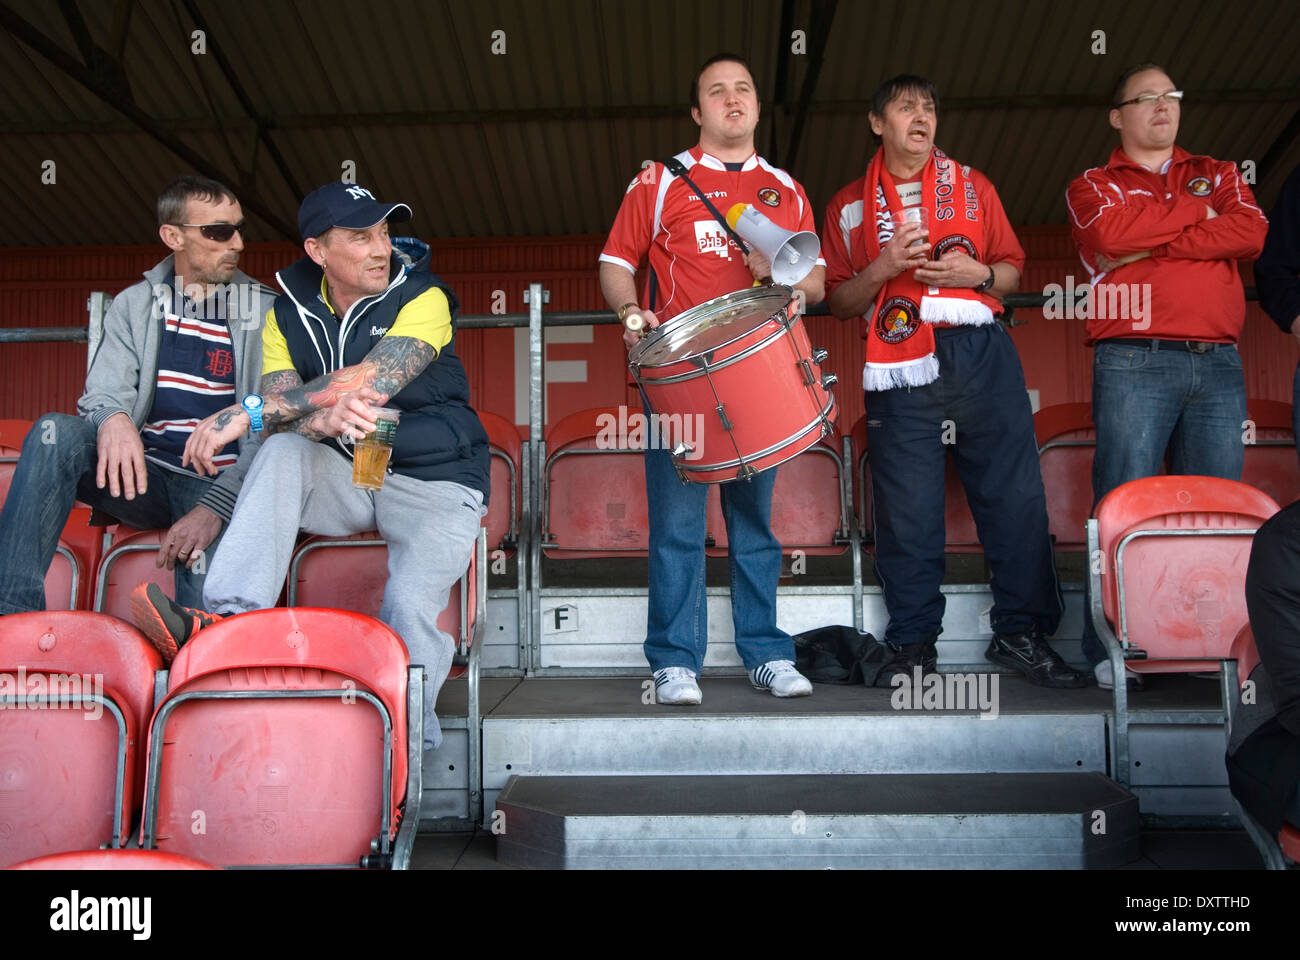 L'équipe de football de la flotte à l'accueil 'partisans'. Ebbsfleet v Tunbridge. Ebbsfleet Valley Kent UK. Photo Stock